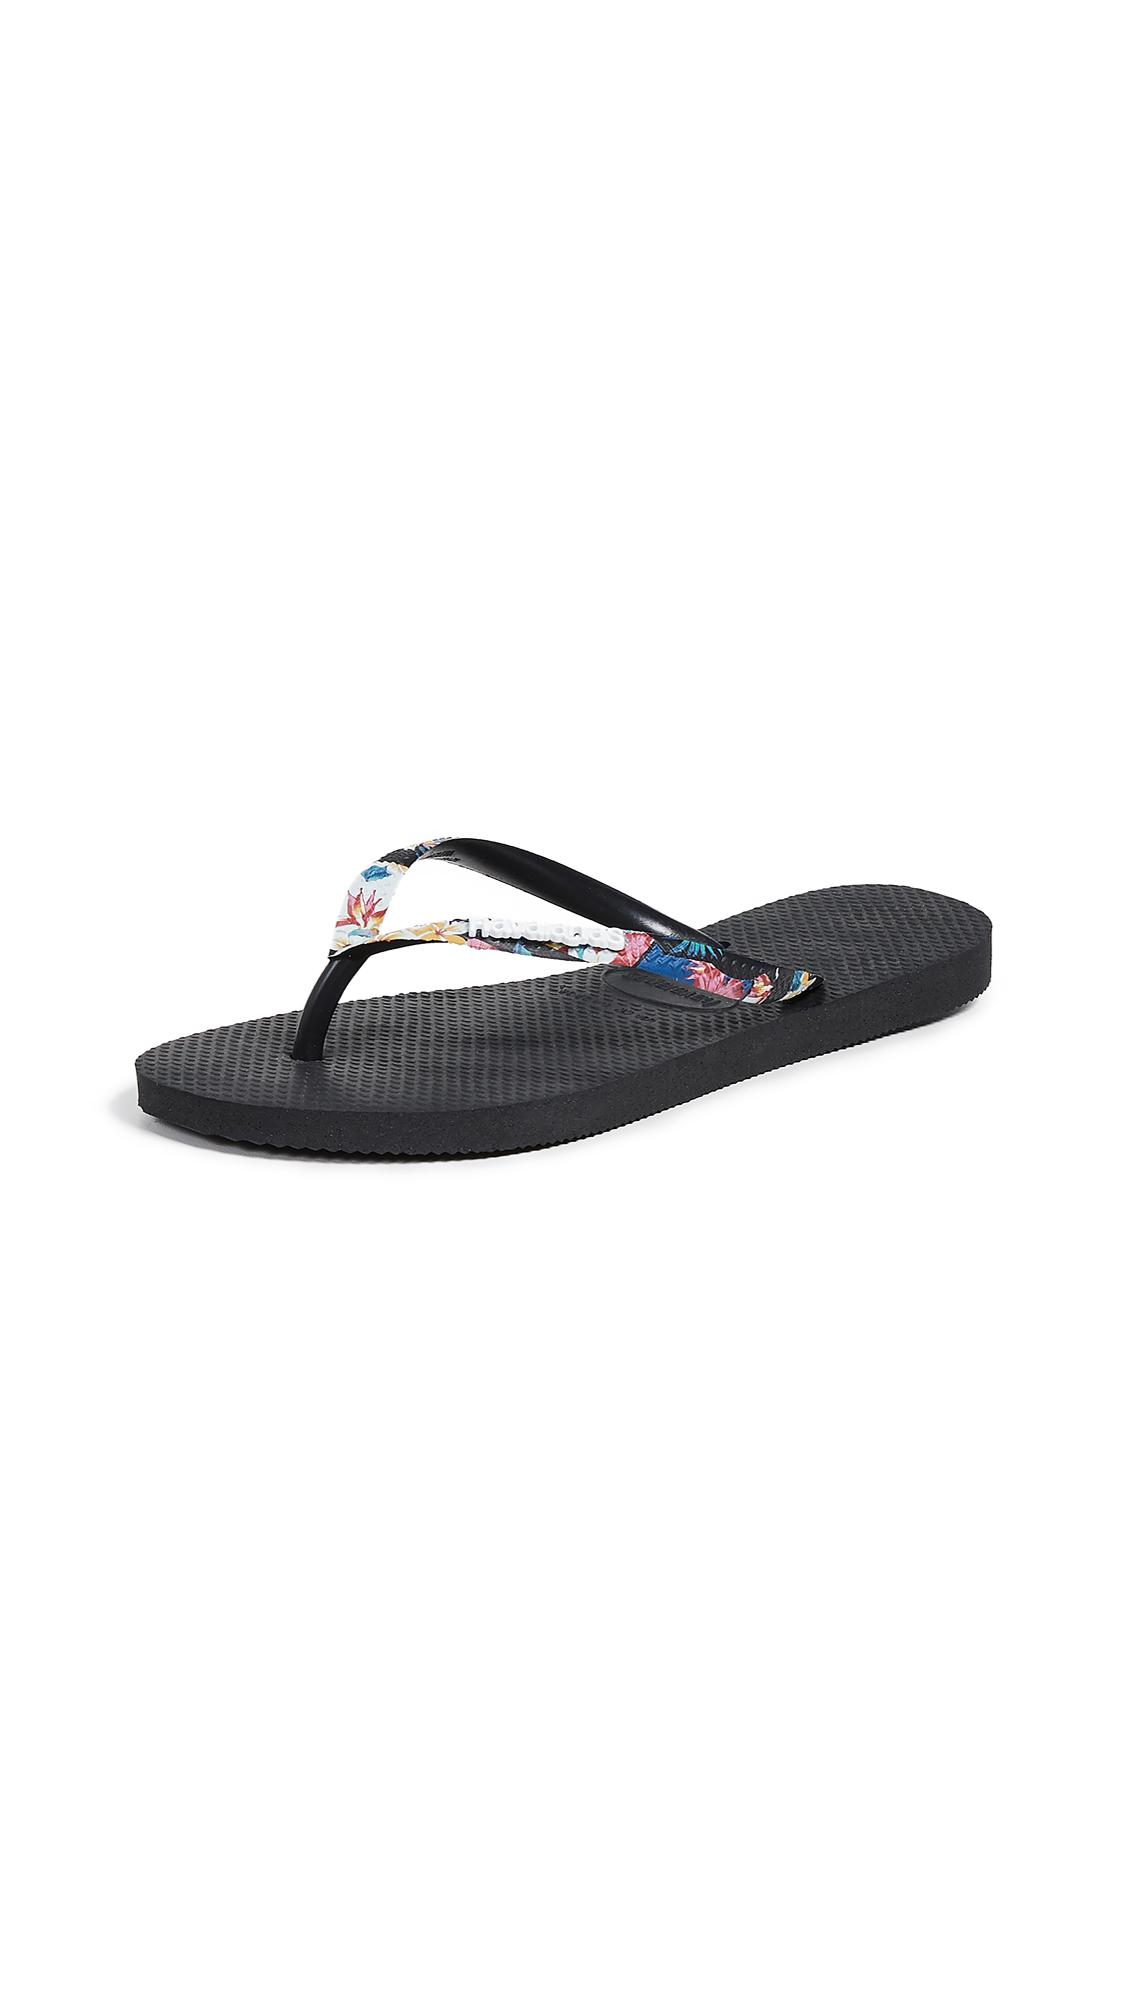 Havaianas Slim Tropical Strap Flip Flops - Black/Mystic